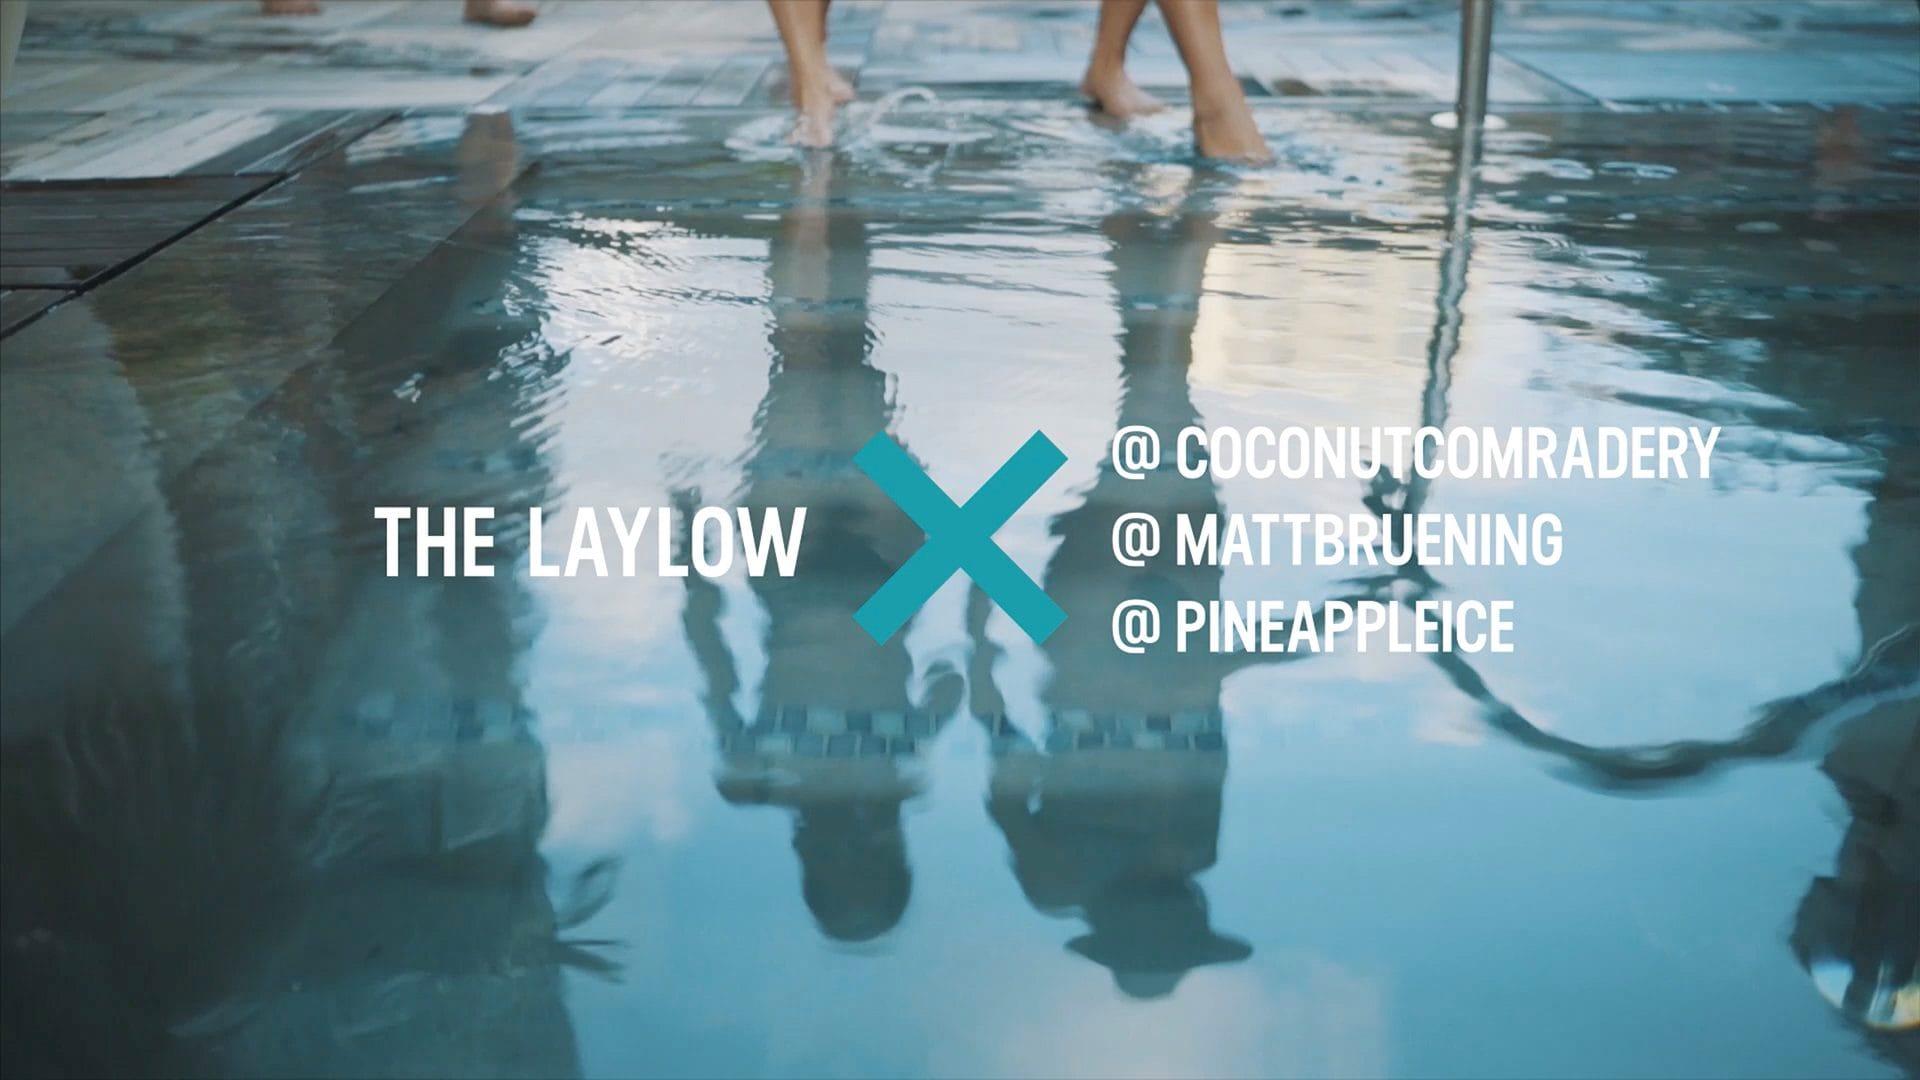 The Laylow x pineappleice, mattbruening, & coconutcomradery